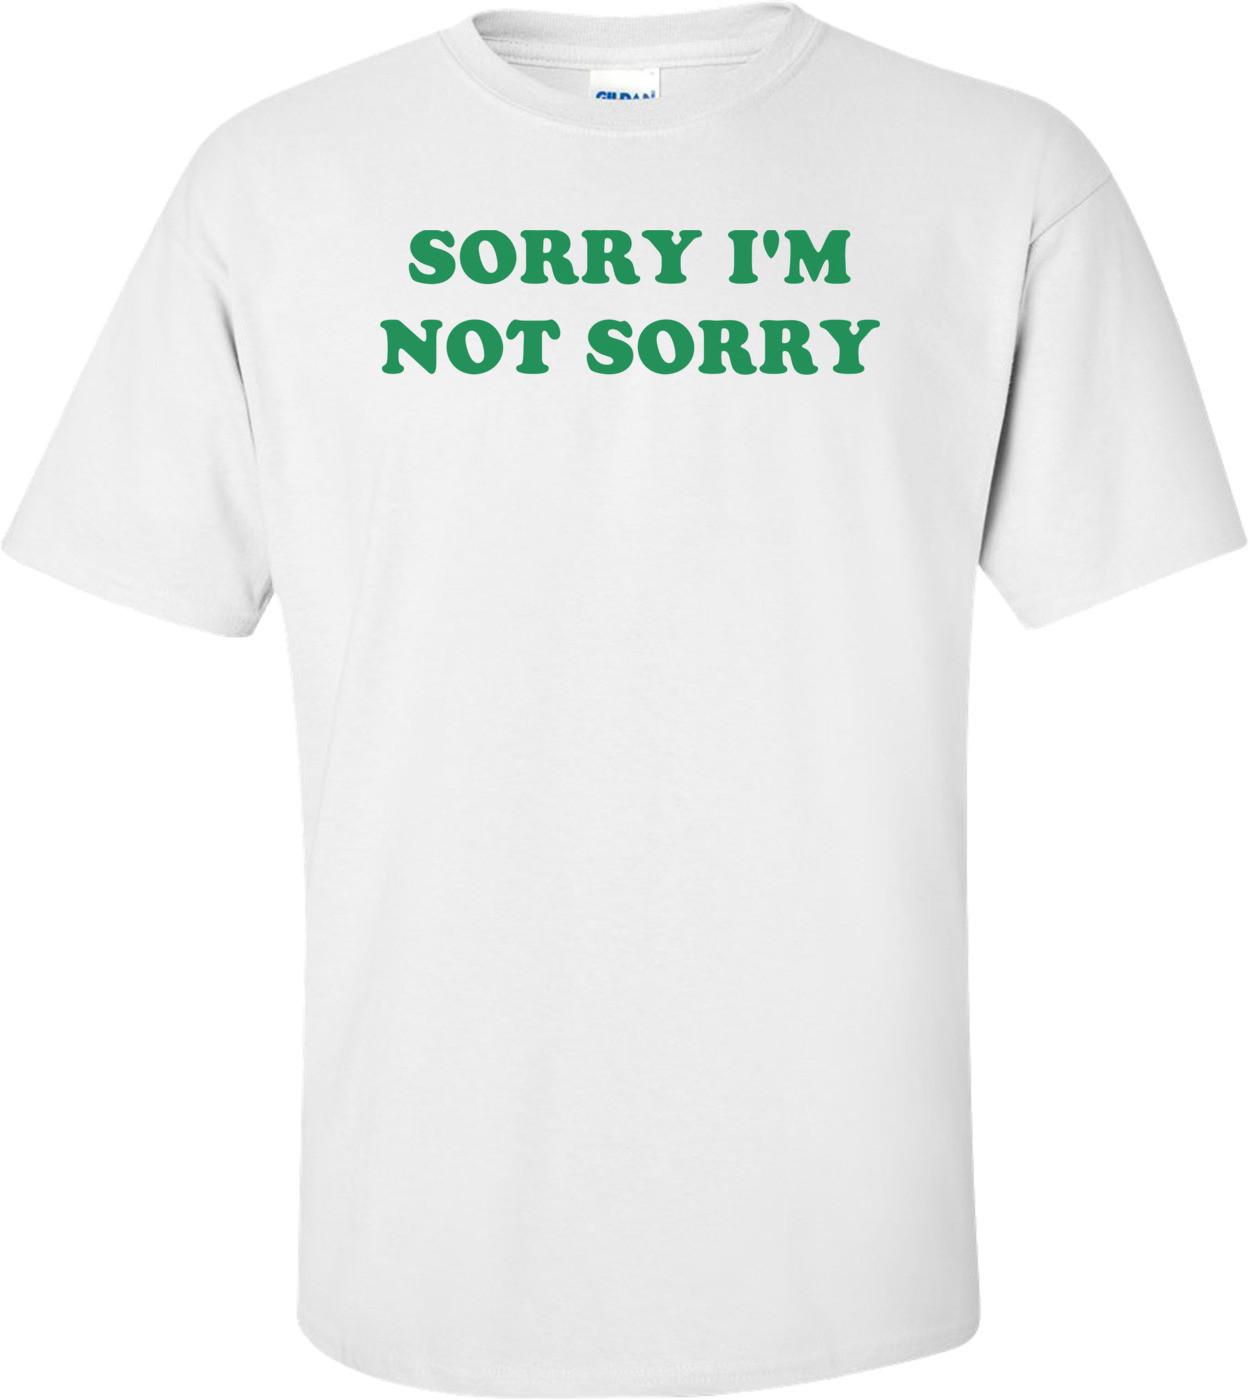 SORRY I'M NOT SORRY Shirt